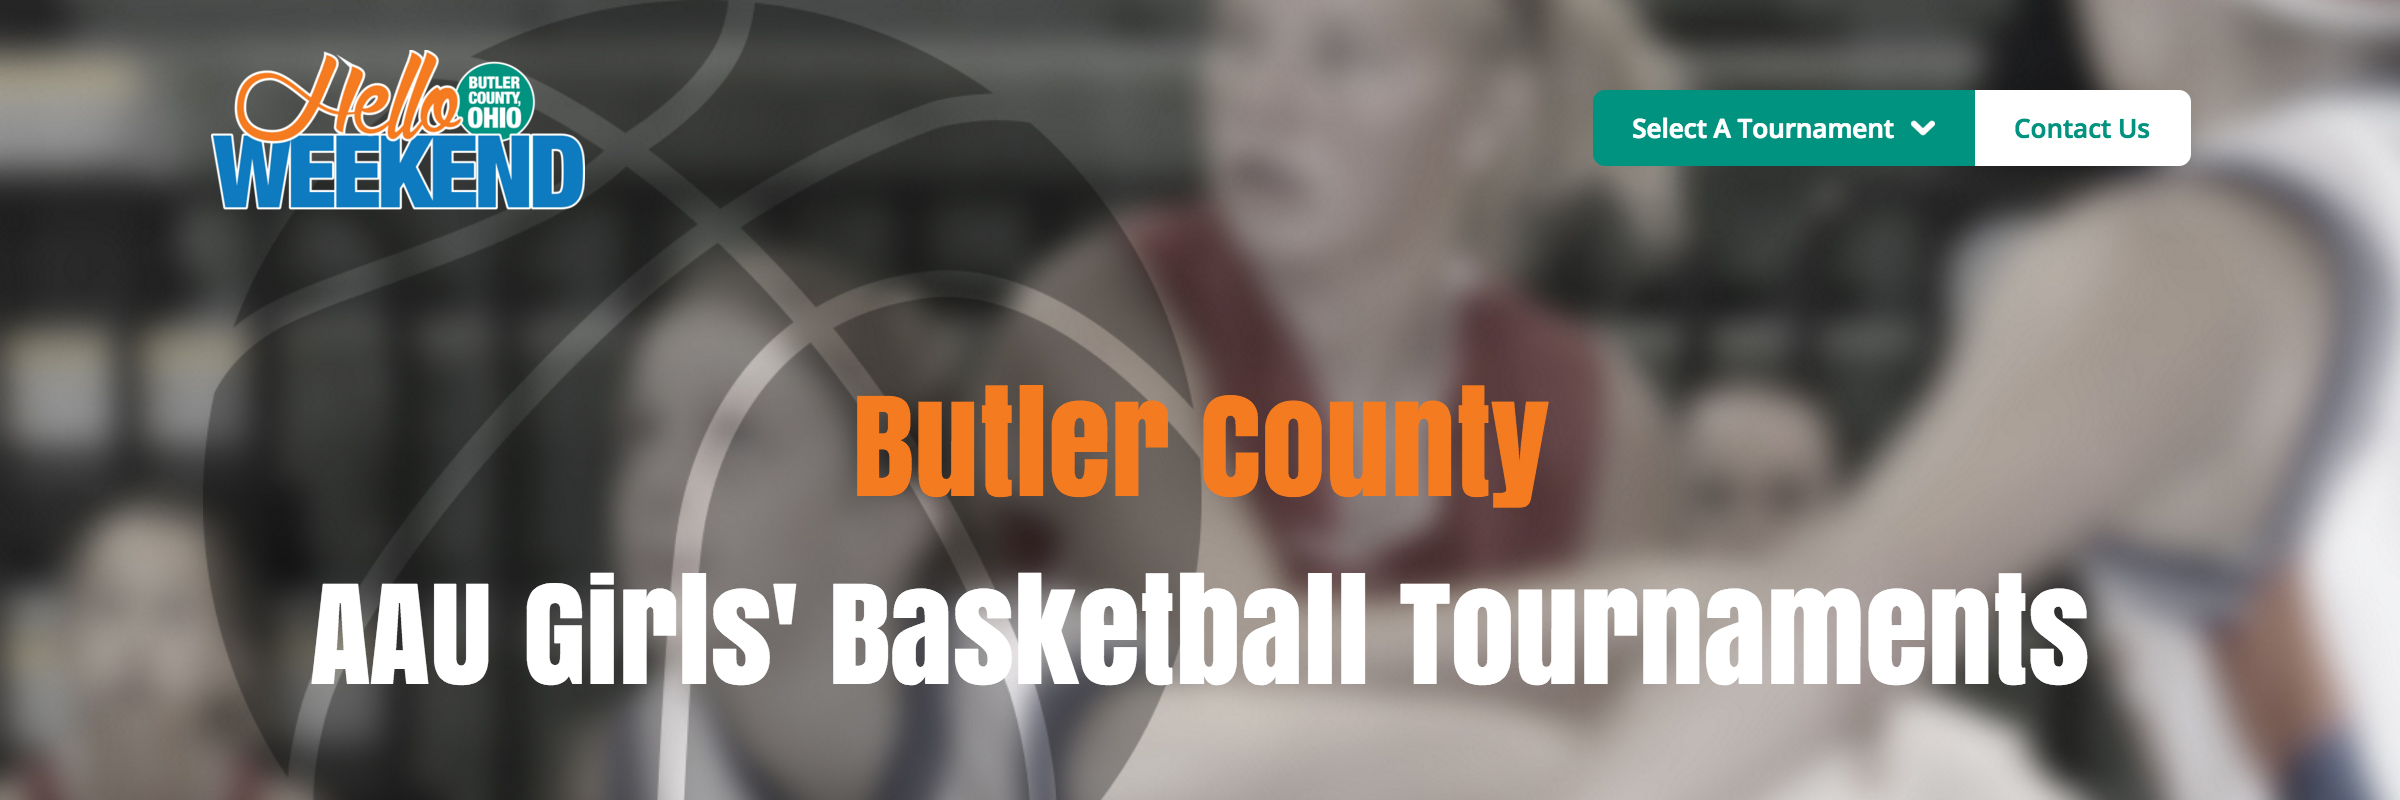 AAU in Butler County 2015